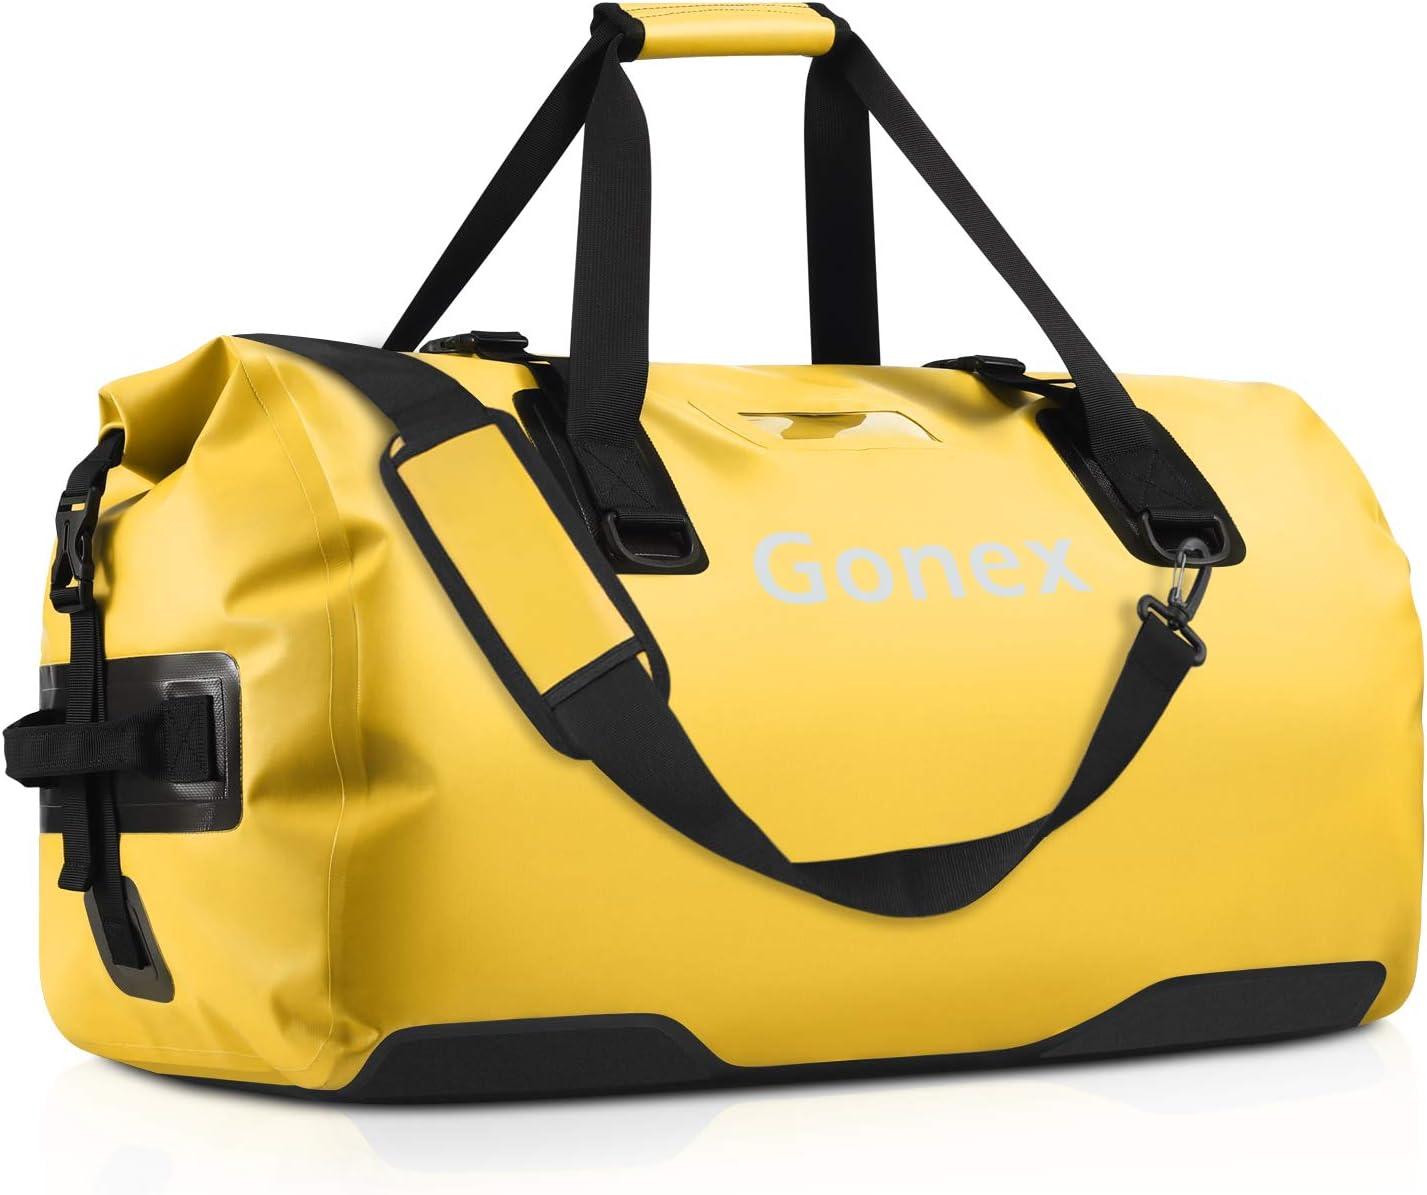 Gonex 40L 60L 80L Extra Large 直営ストア Duffe 激安超特価 Travel Duffle Waterproof Dry